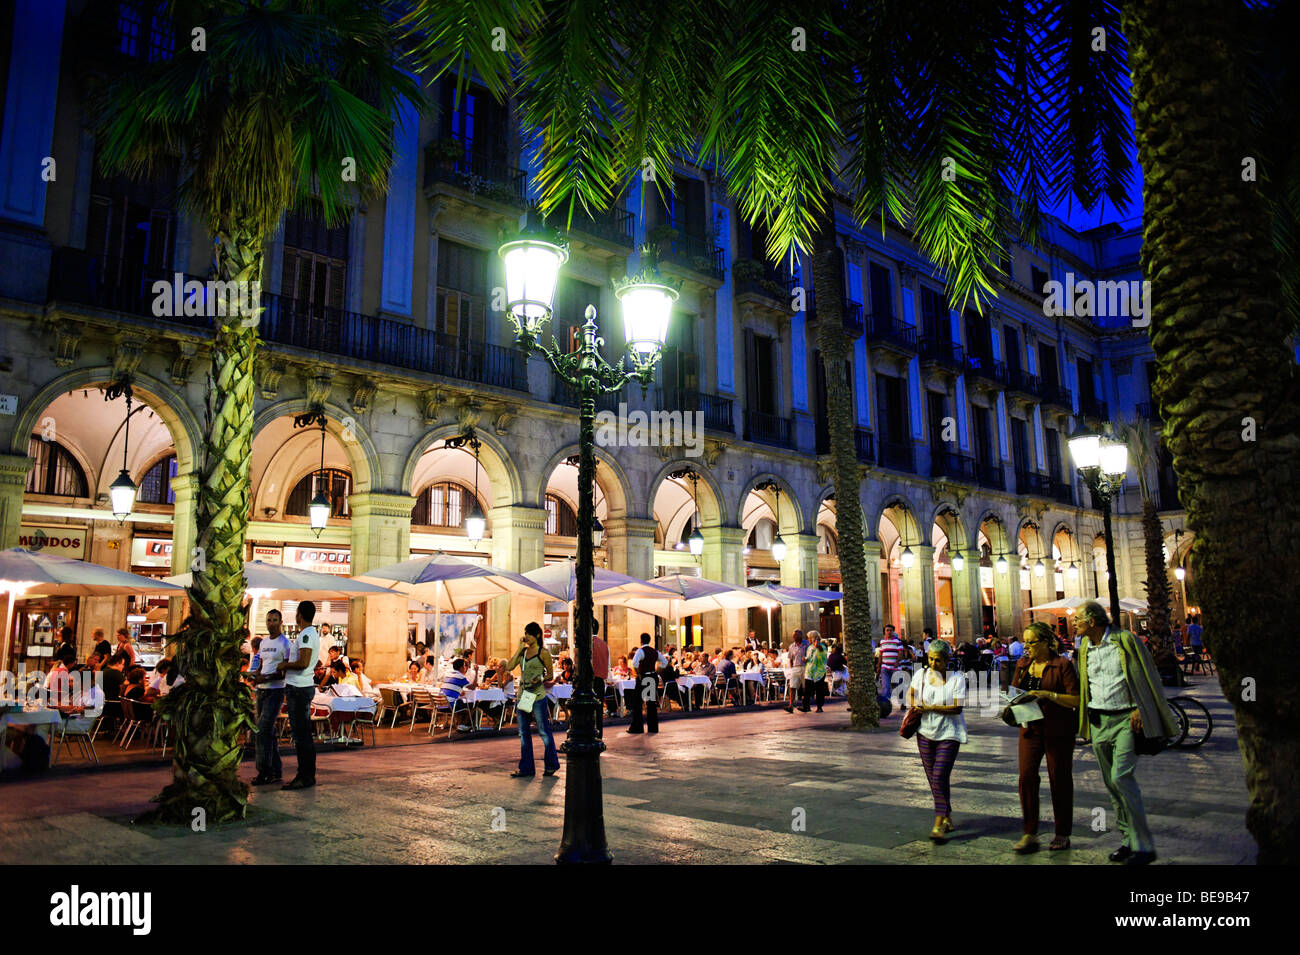 People dining alfresco on Plaza Reial. Barcelona. Spain - Stock Image